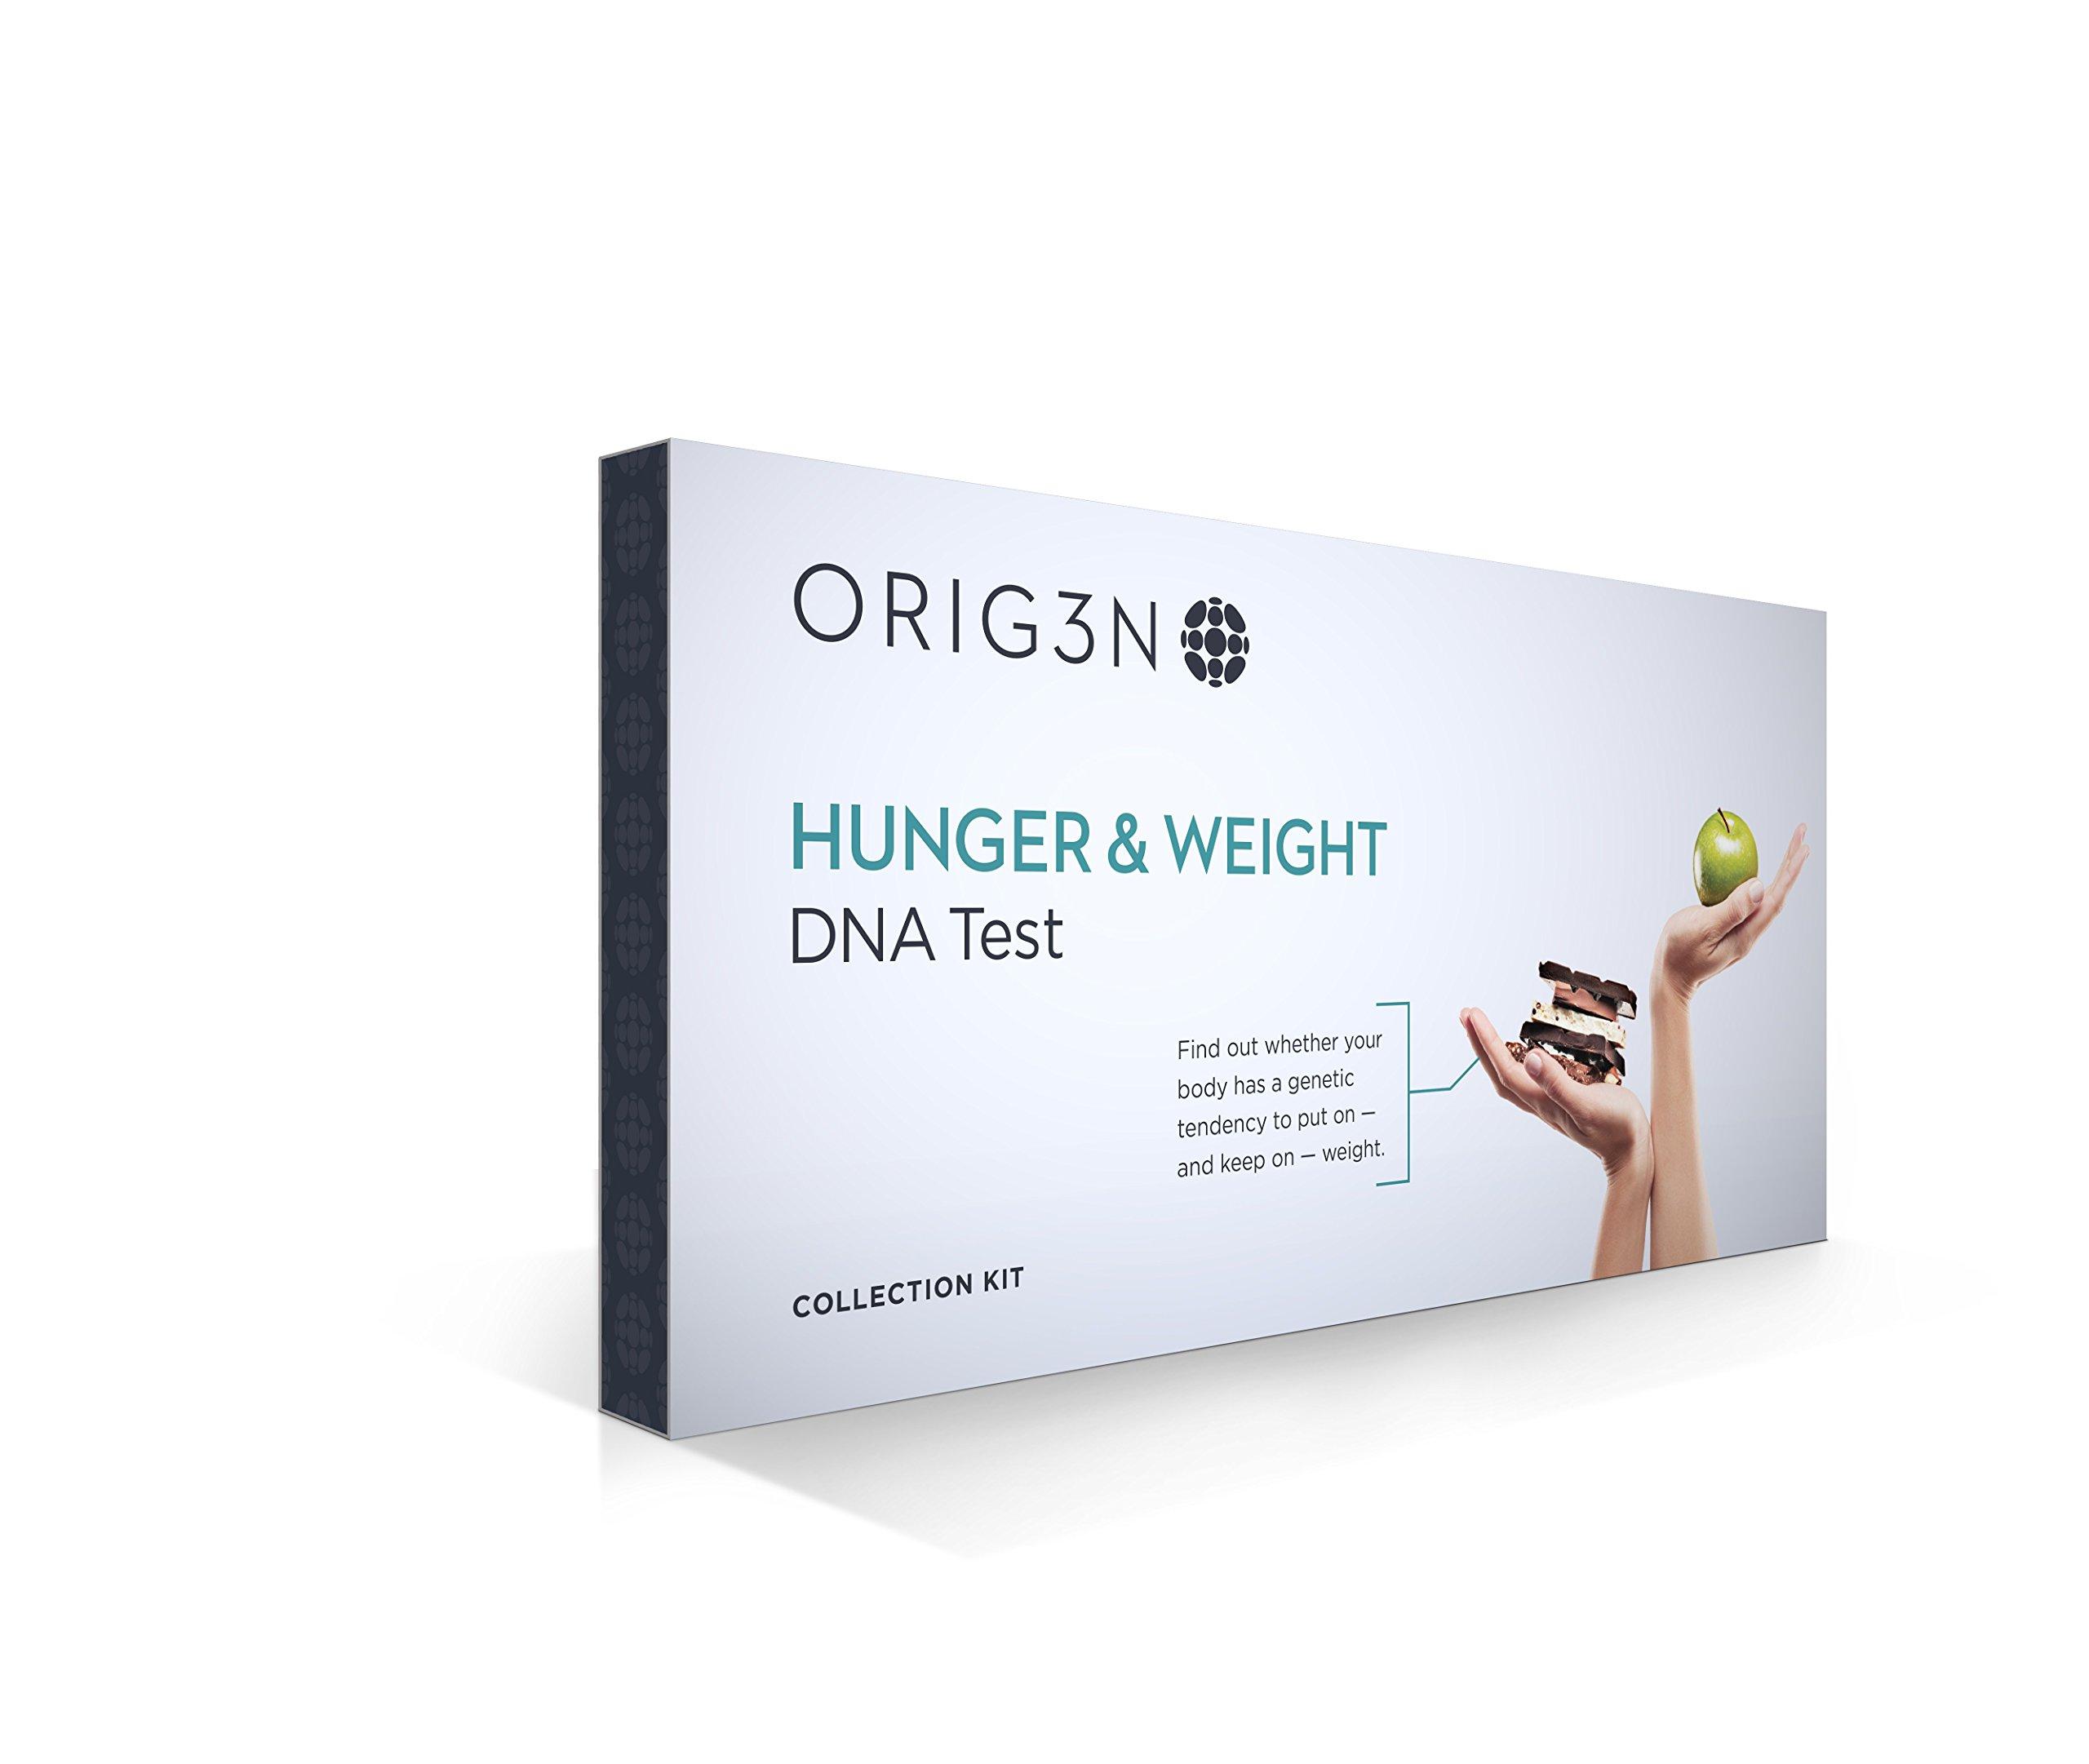 ORIG3N GeneticHome Mini DNA Test Kit, Hunger & Weight